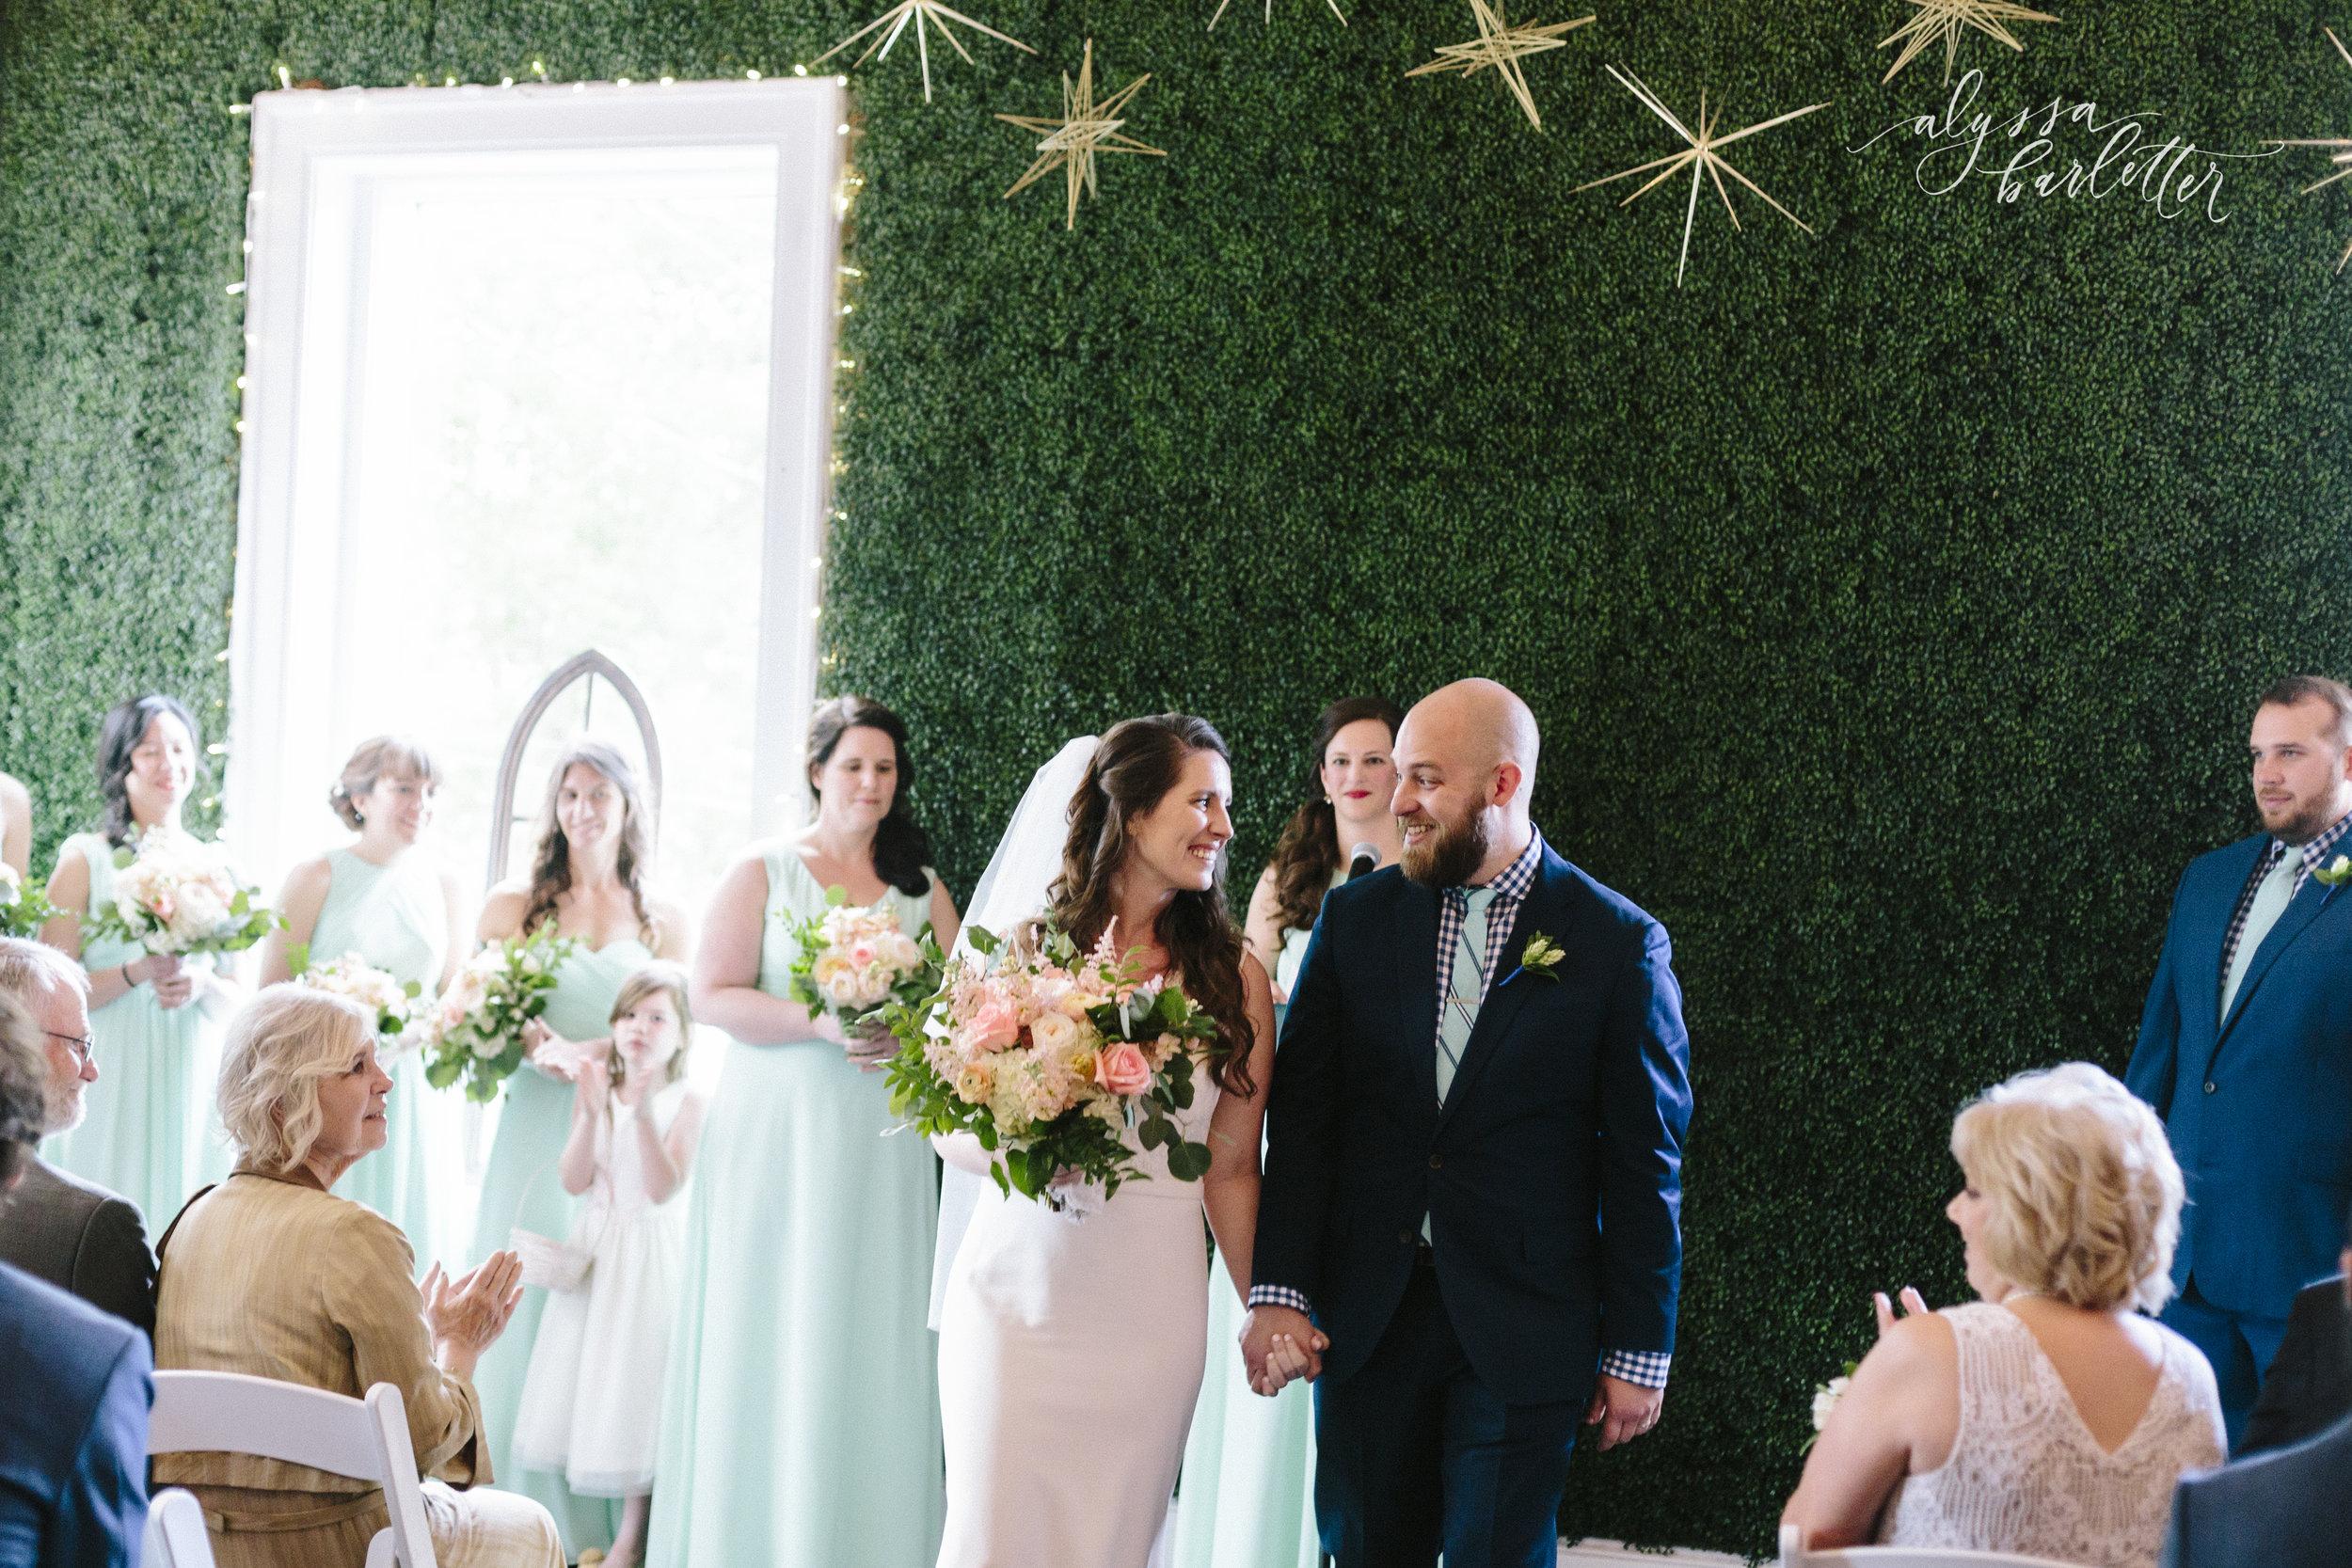 alyssa barletter photography kansas city wedding 2016 main courtney and brian-1-21.jpg